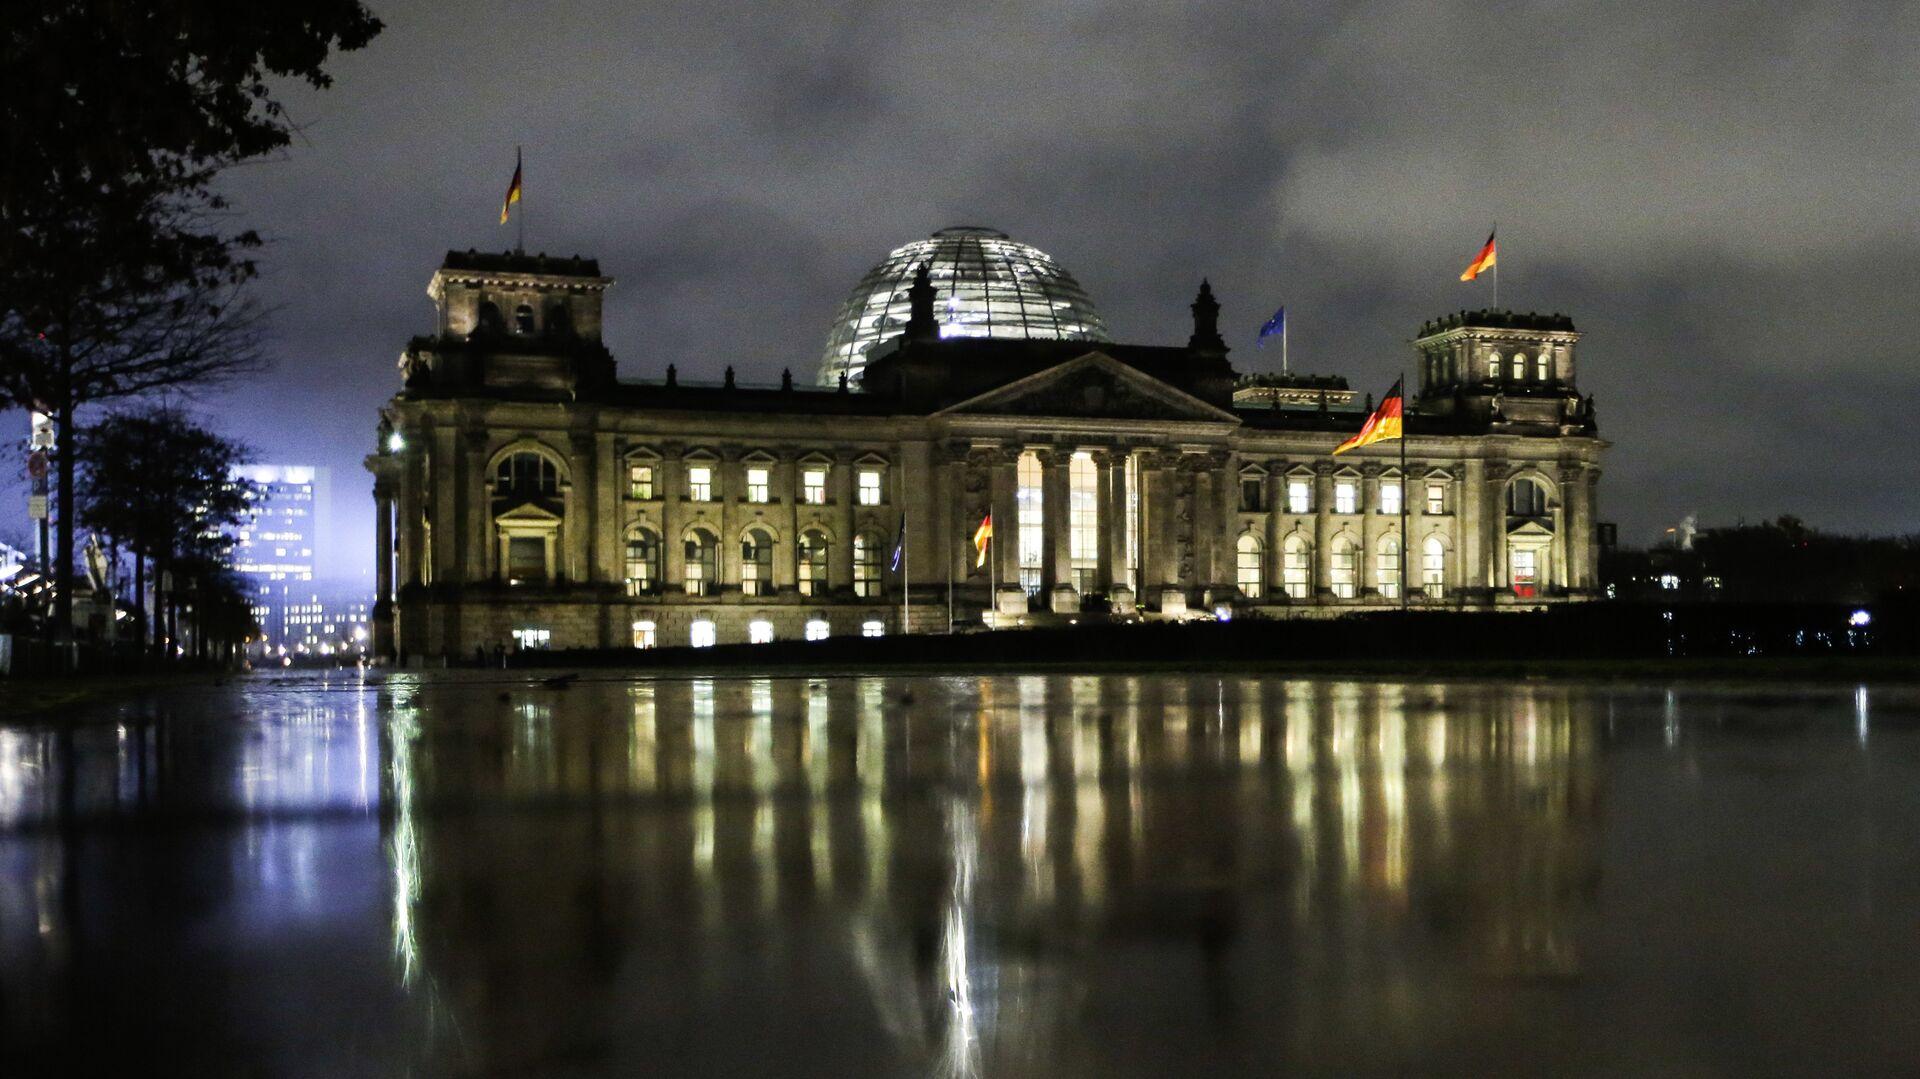 Здание немецкого парламента Бундестага - РИА Новости, 1920, 08.09.2020